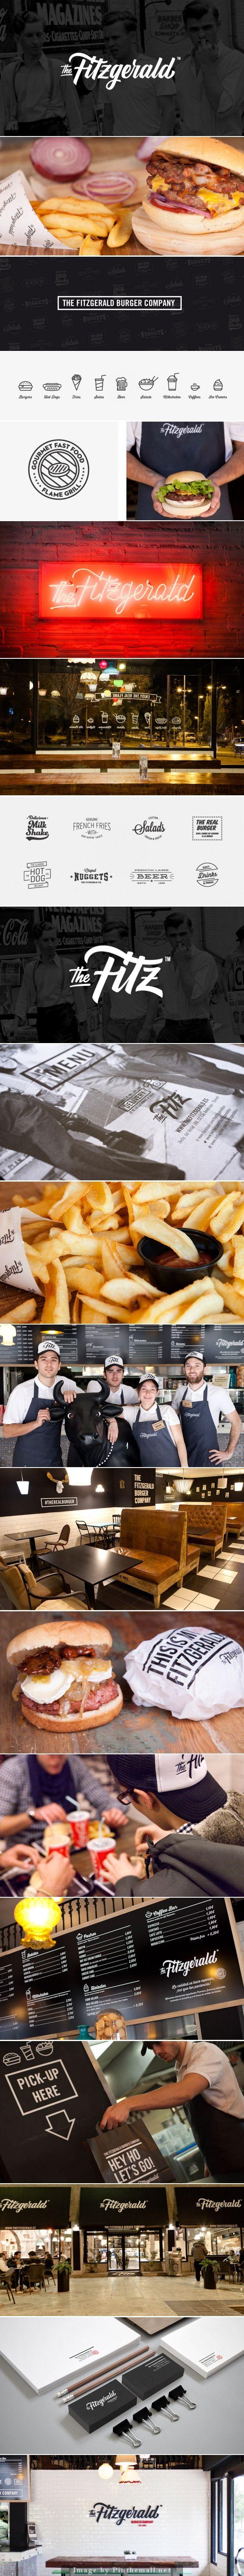 The Fitzgerald Burger Company. Global identity. Credit to Pixelarte. #branding #identity #design